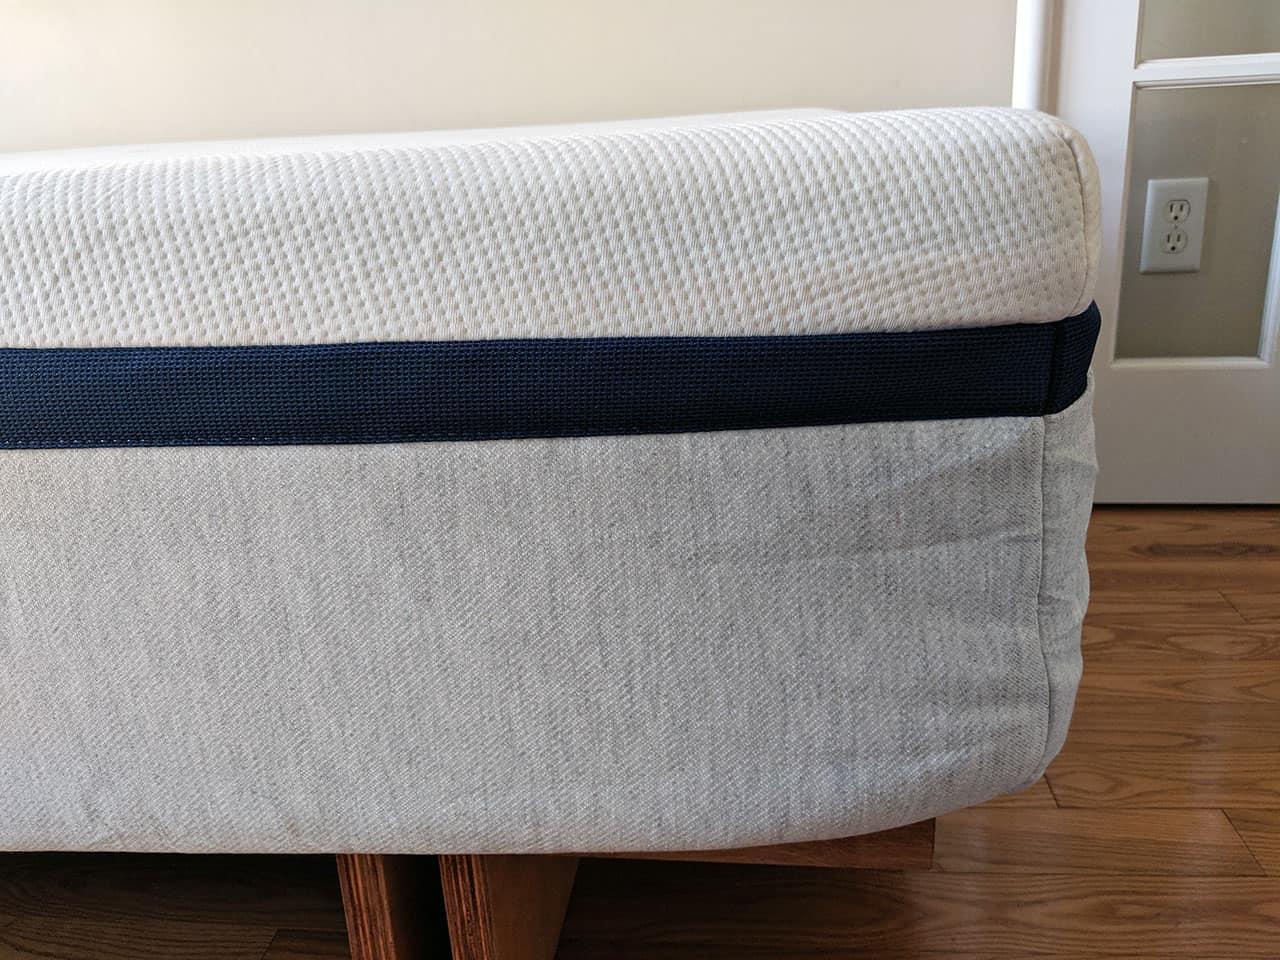 helix midnight mattress01